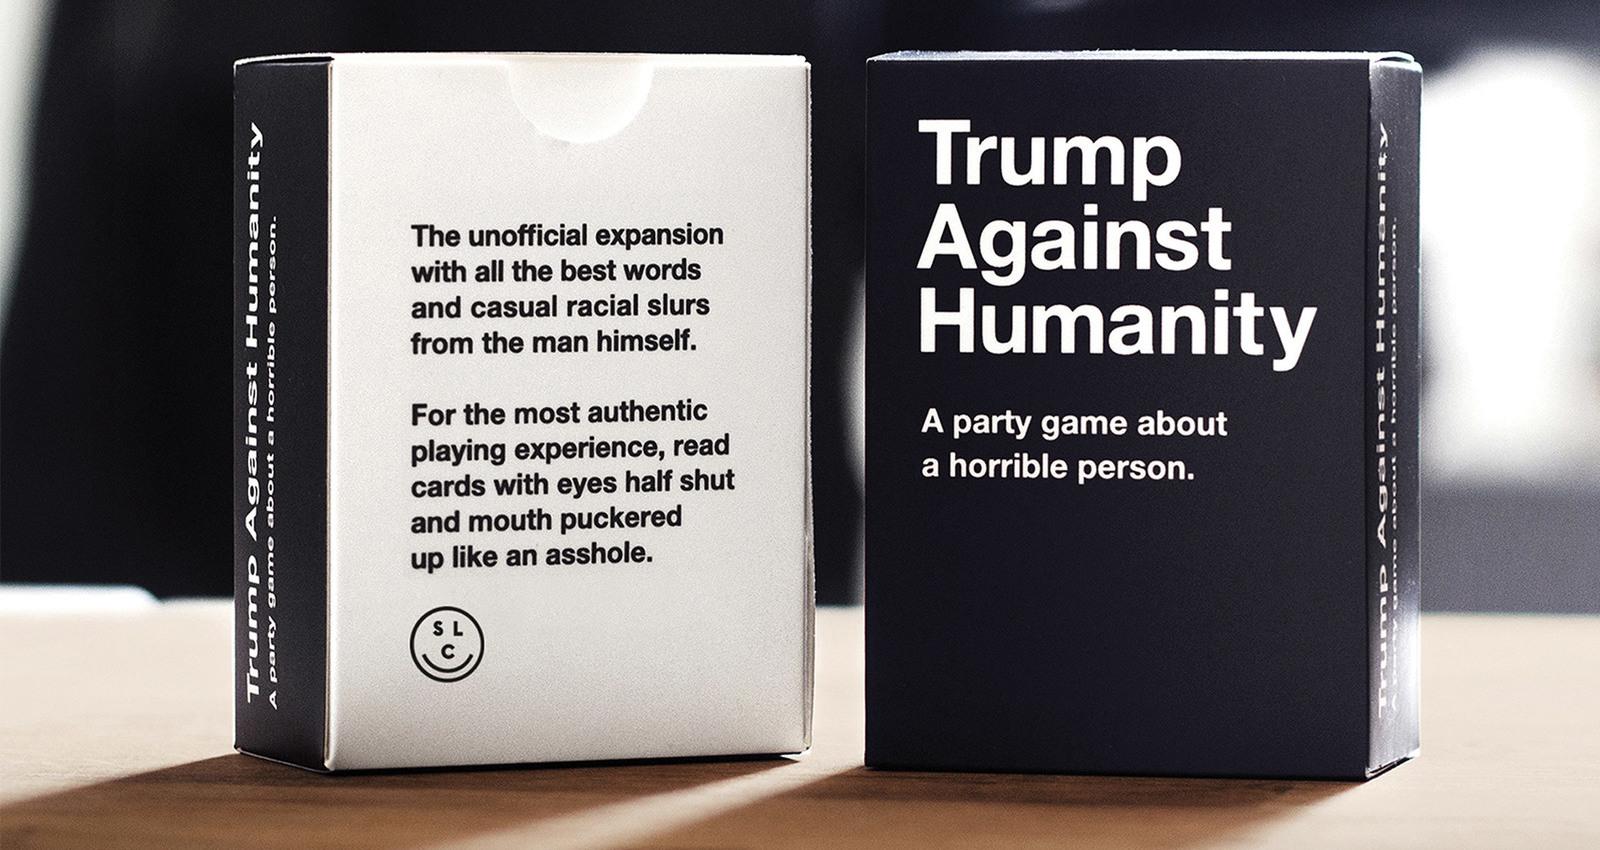 Trump Against Humanity